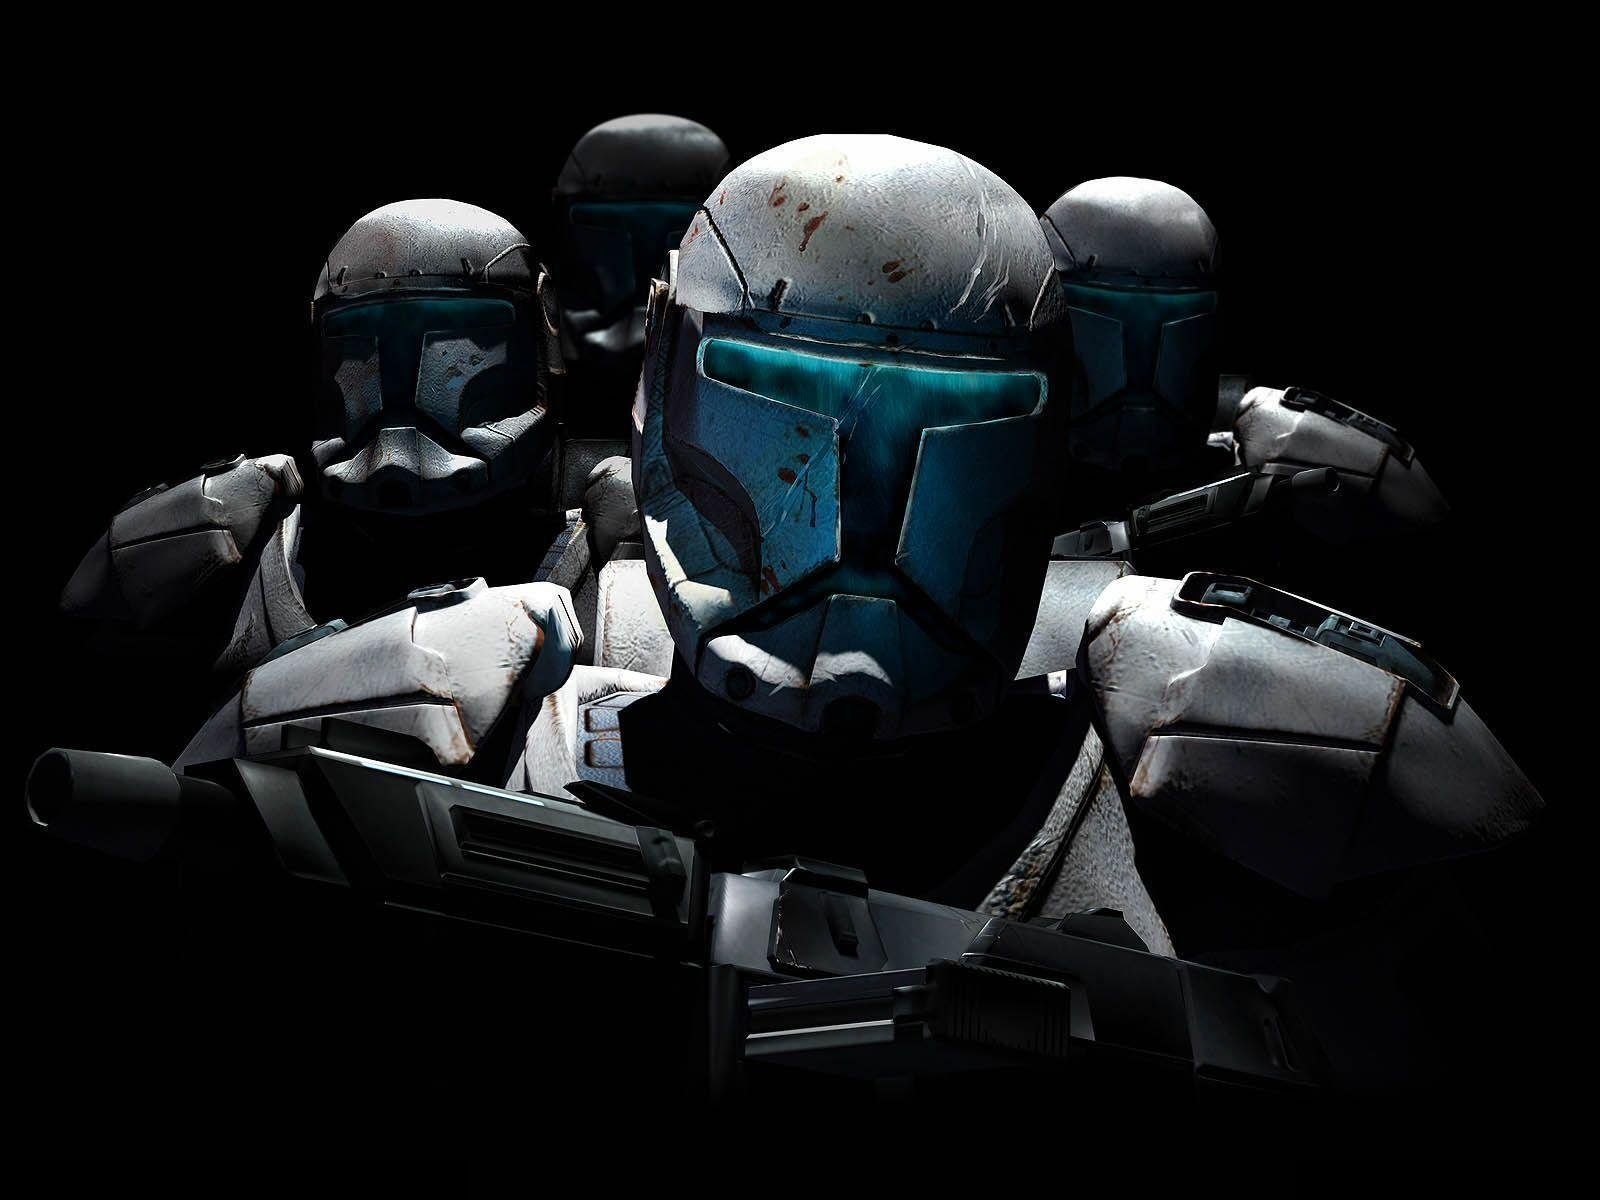 epic star wars trooper wallpaper - photo #1